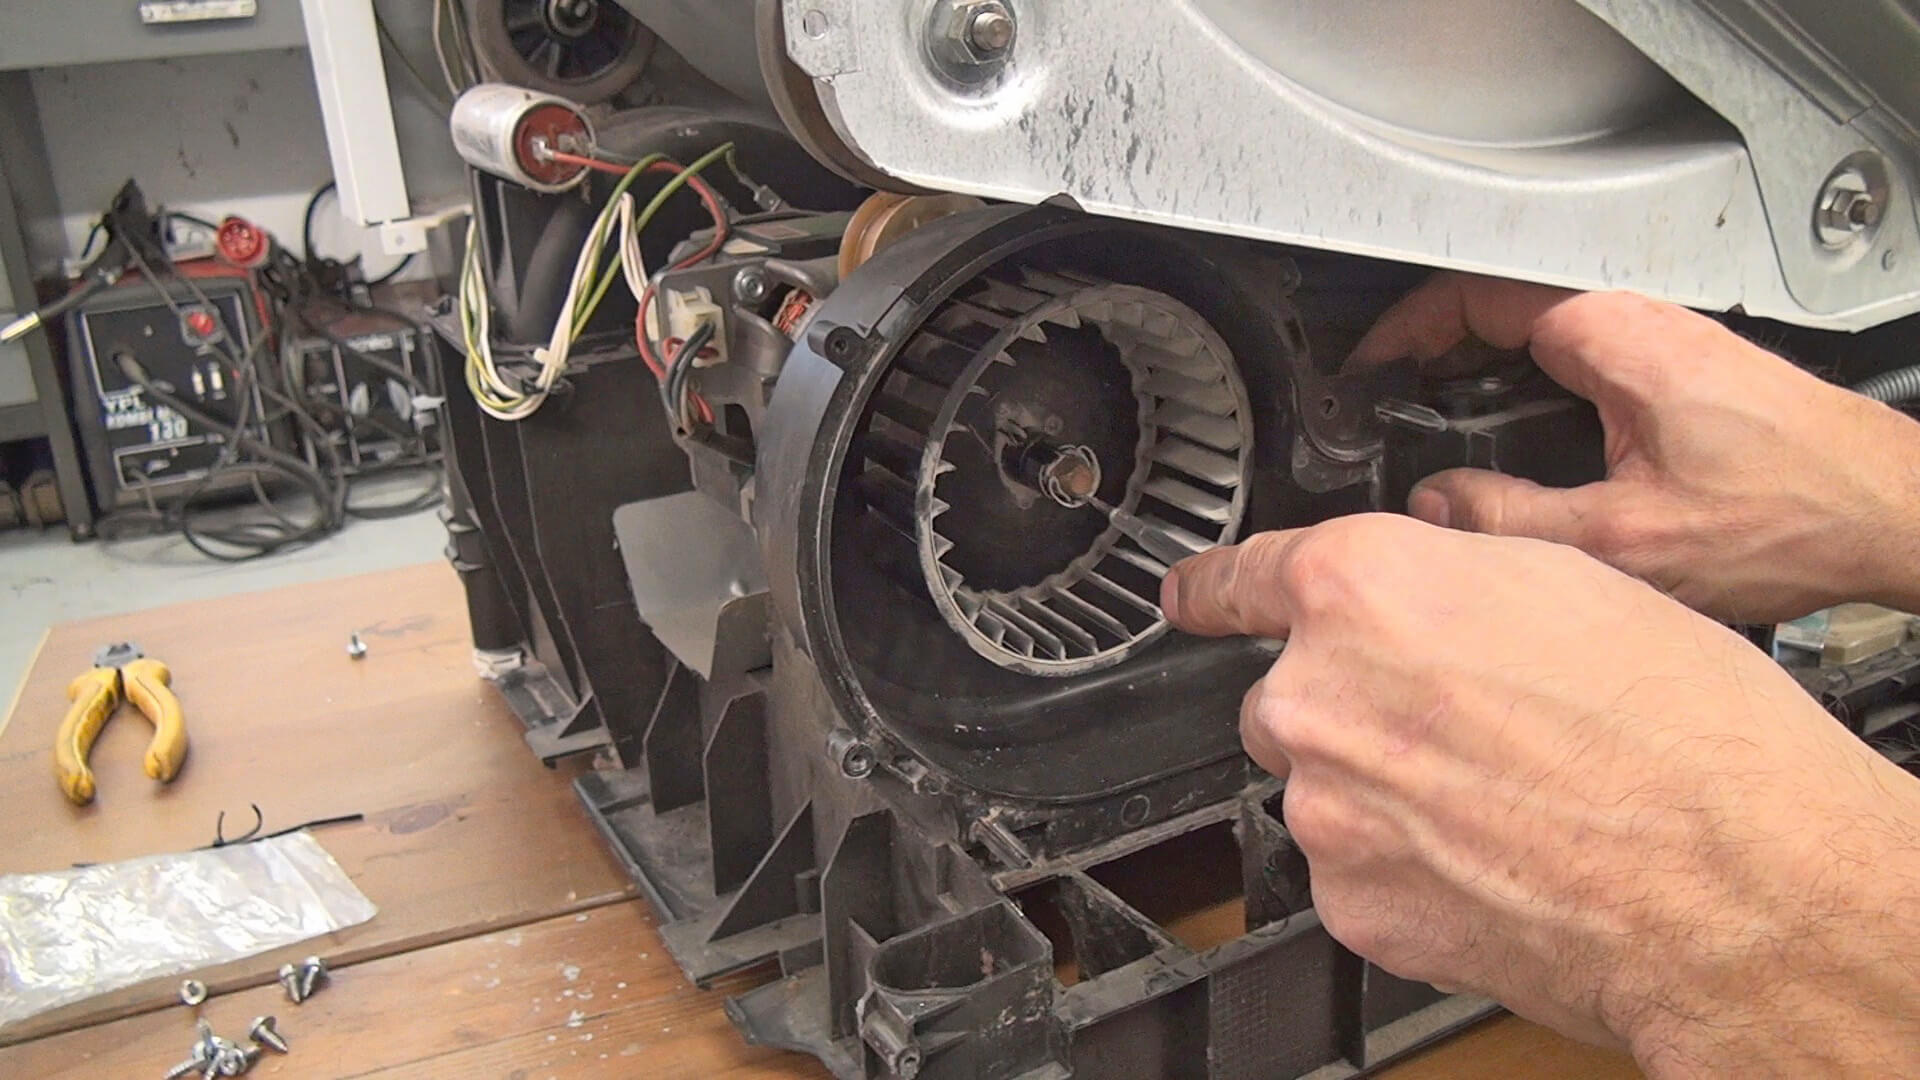 Siemens Kühlschrank Quietscht : Siemens kühlschrank quietscht bauknecht kühlschrank einbauen mit